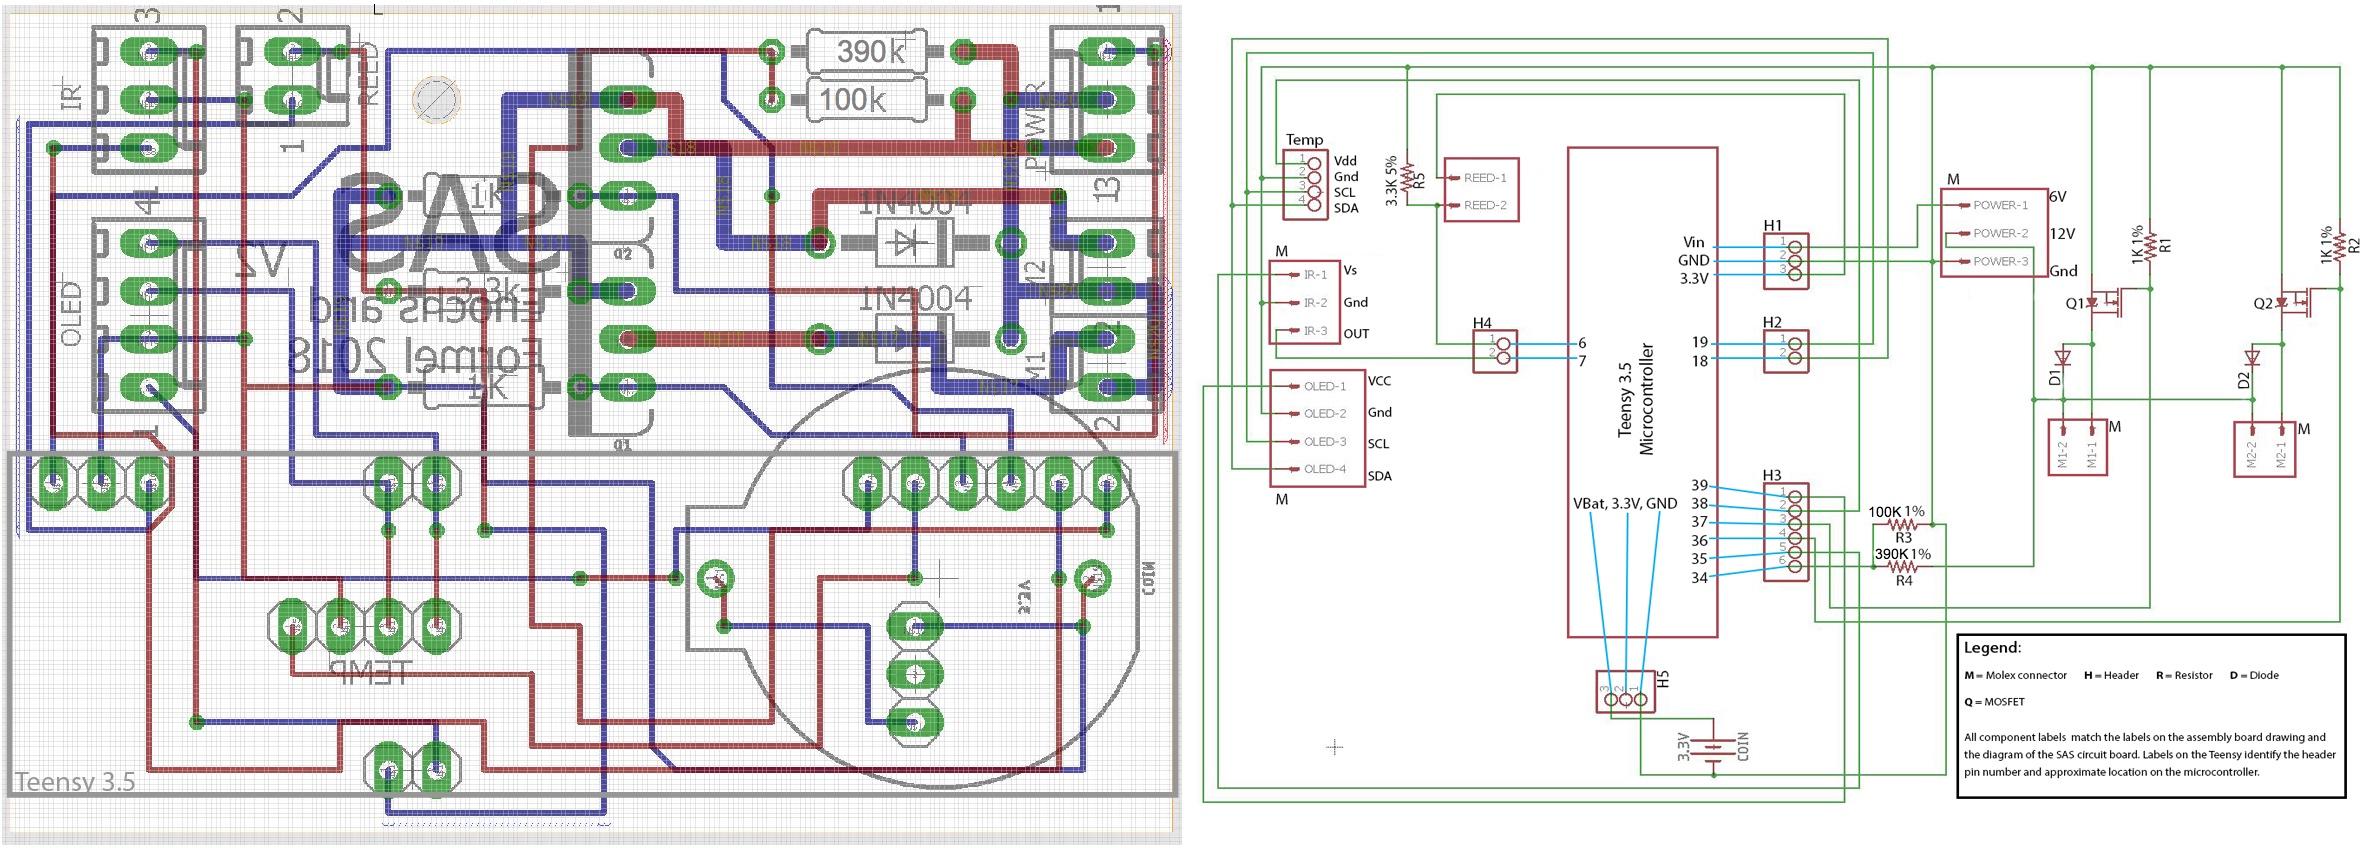 Build A Sas Blue Circuit Board Label An Image